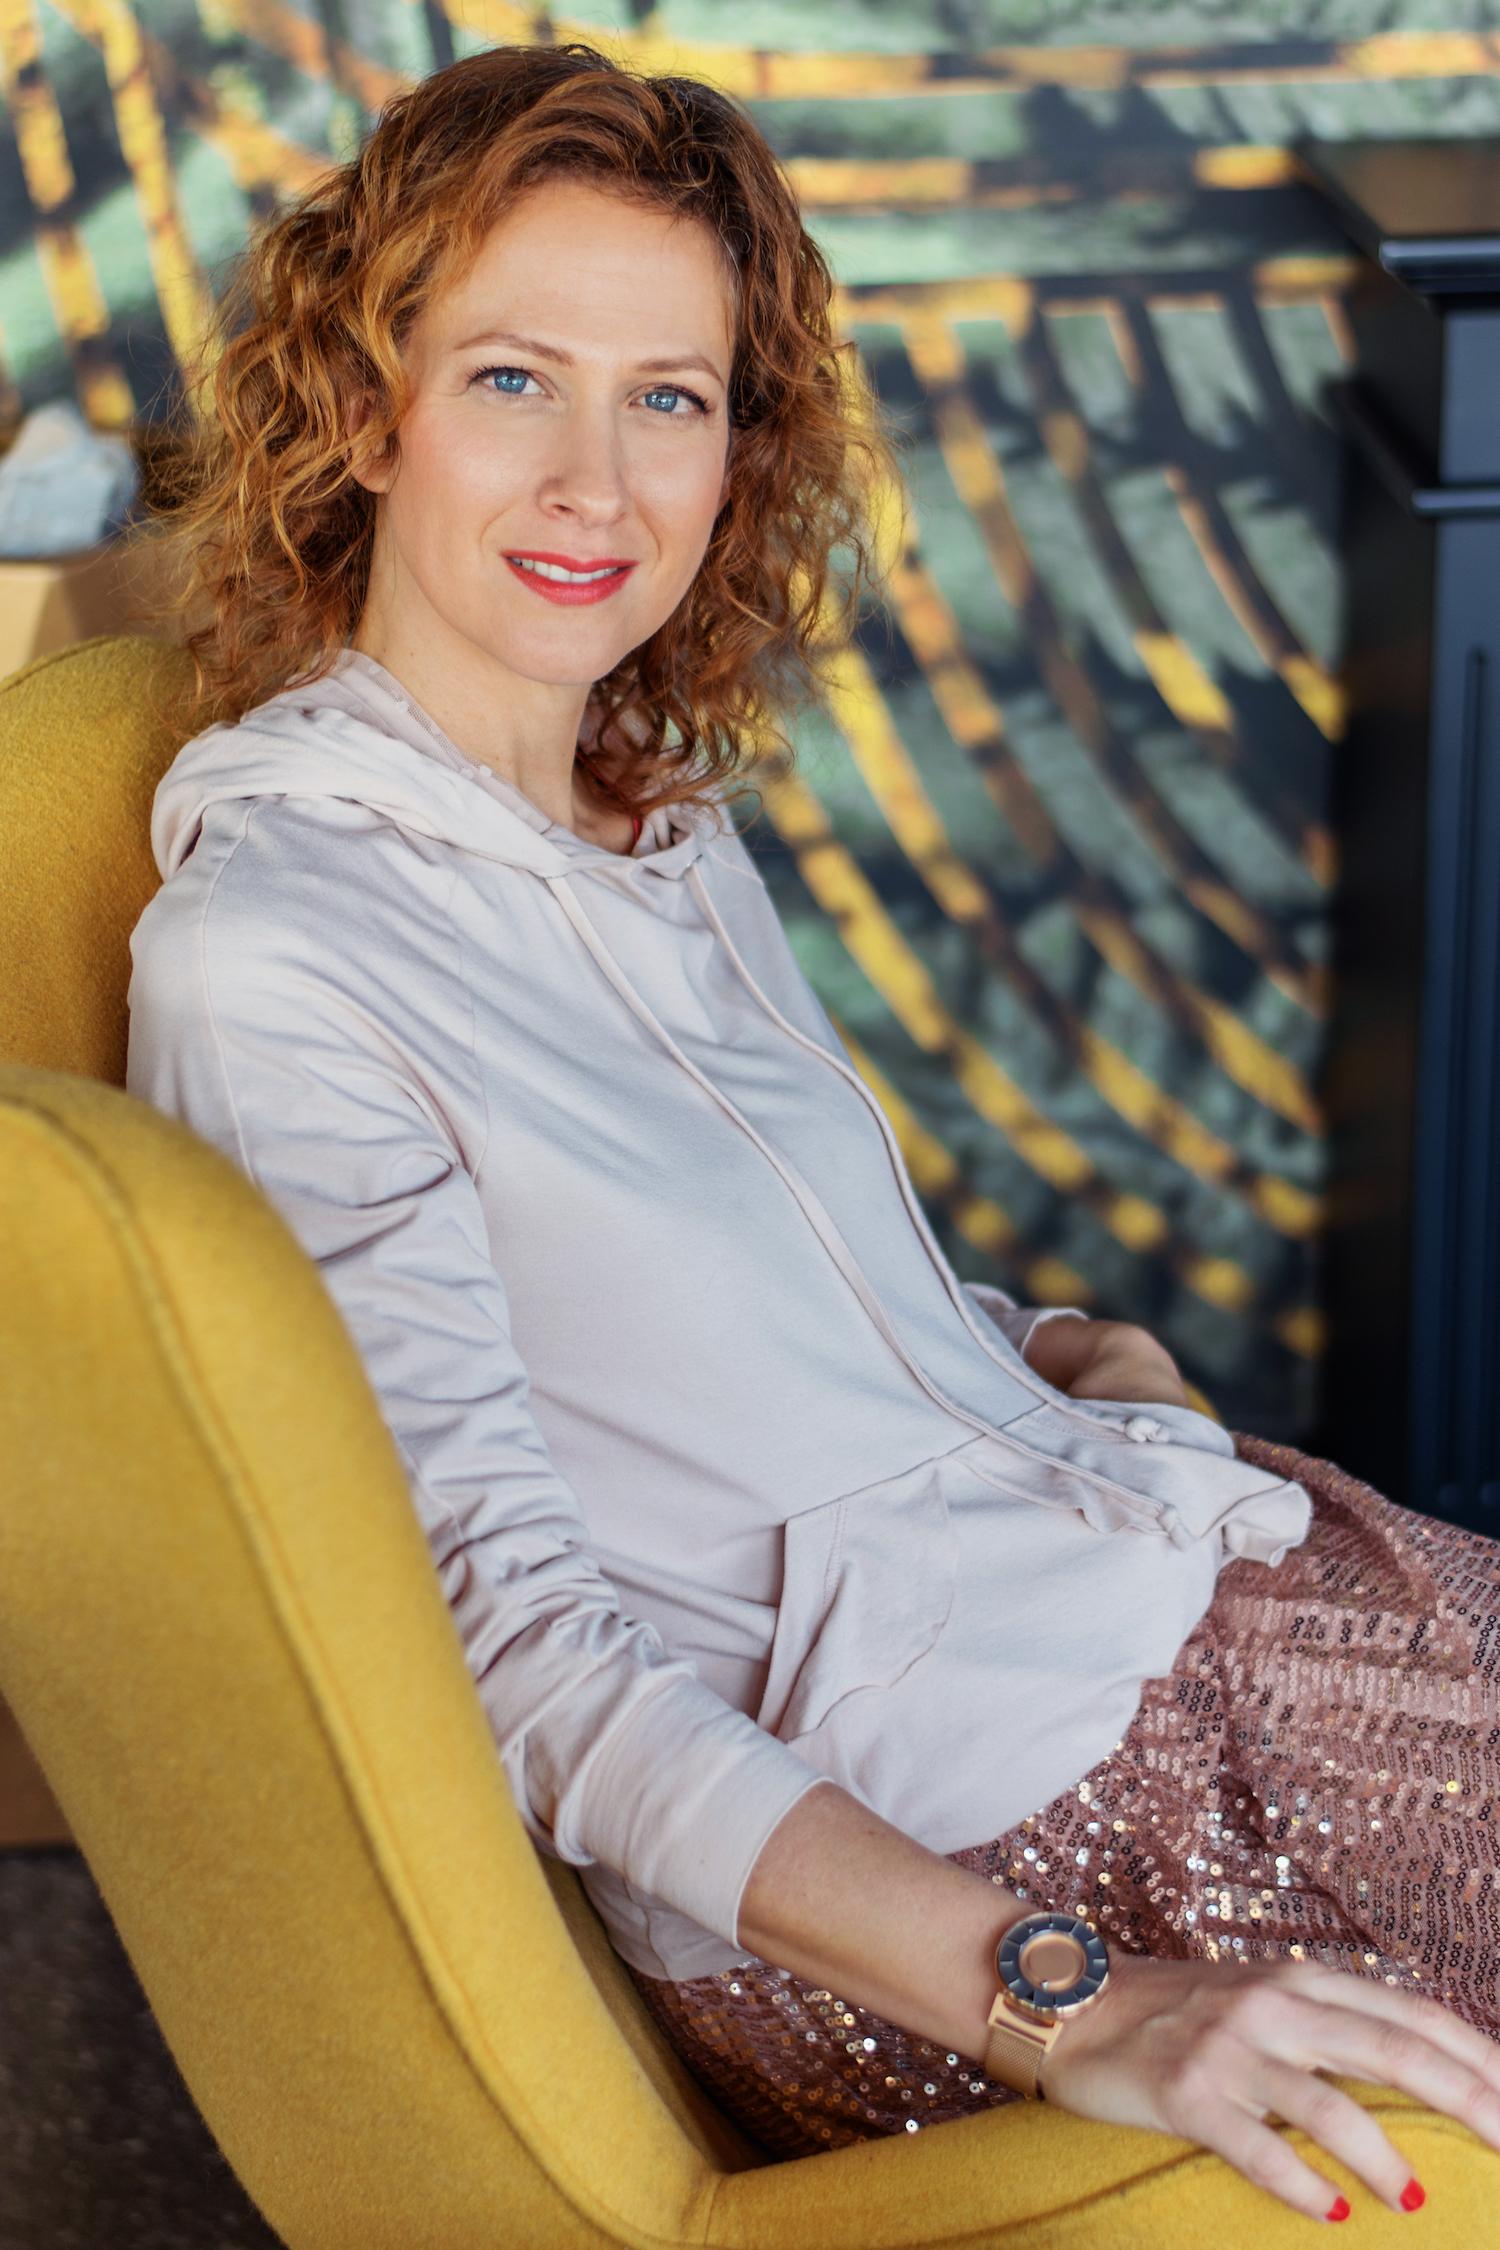 eone bradley trajnosta moda beautyfull blog nika veger 485